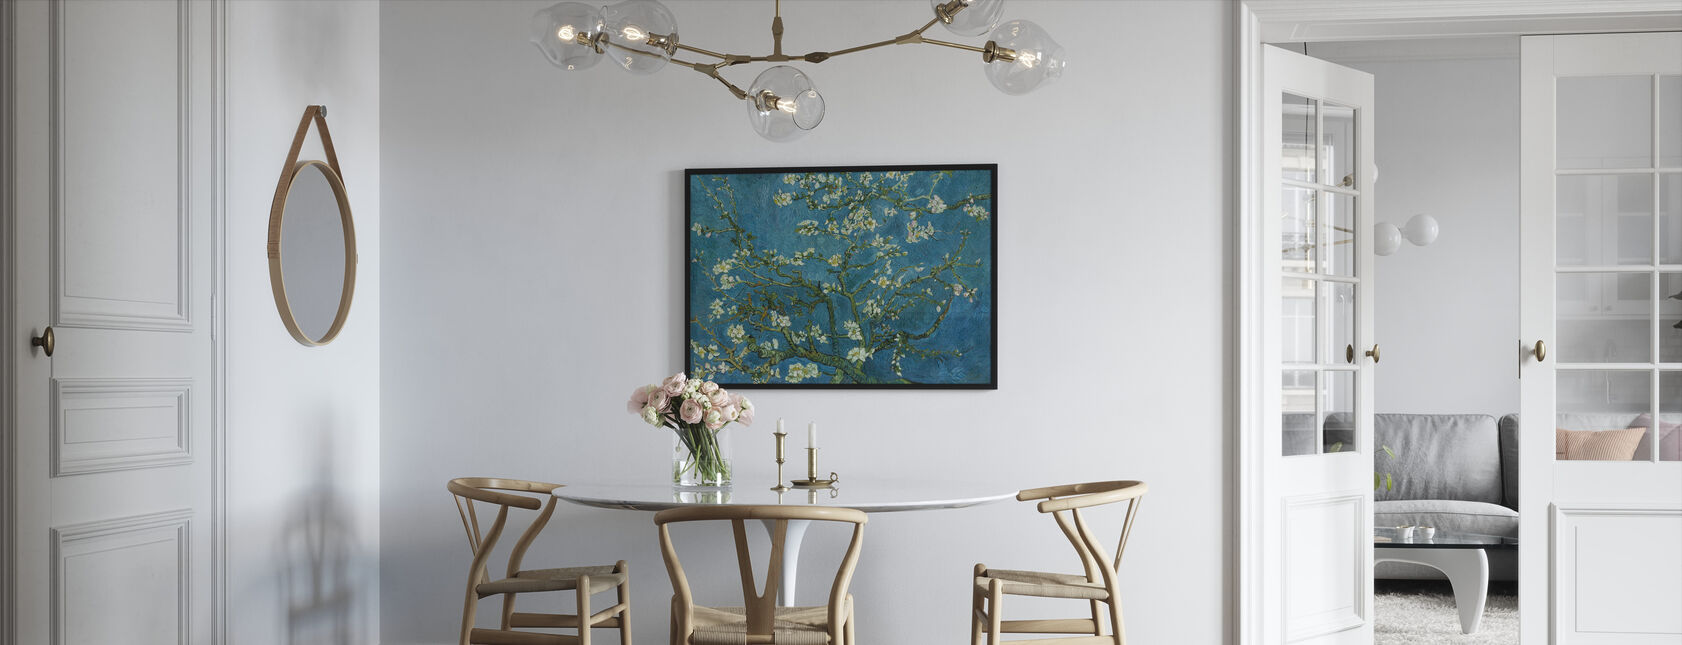 Almond Blossom - Framed print - Kitchen